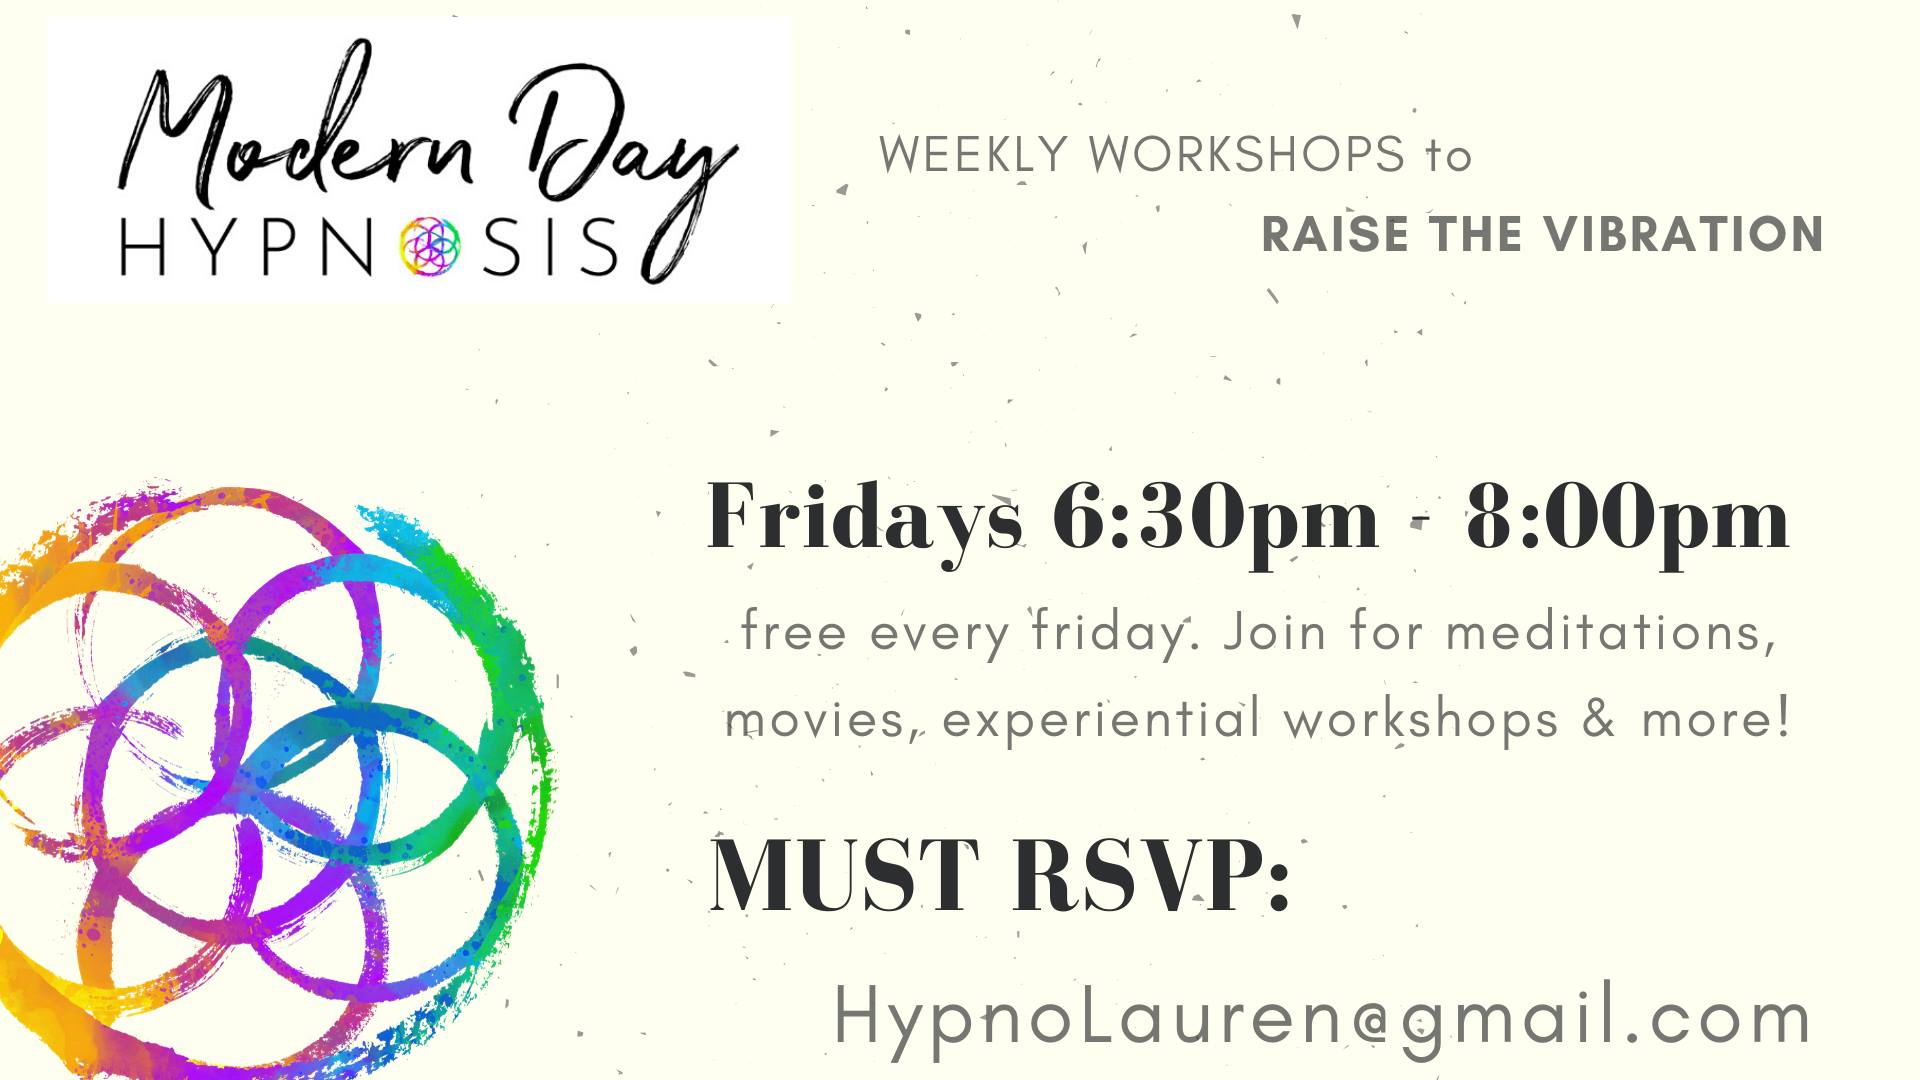 Modern Day Hypnosis Workshop